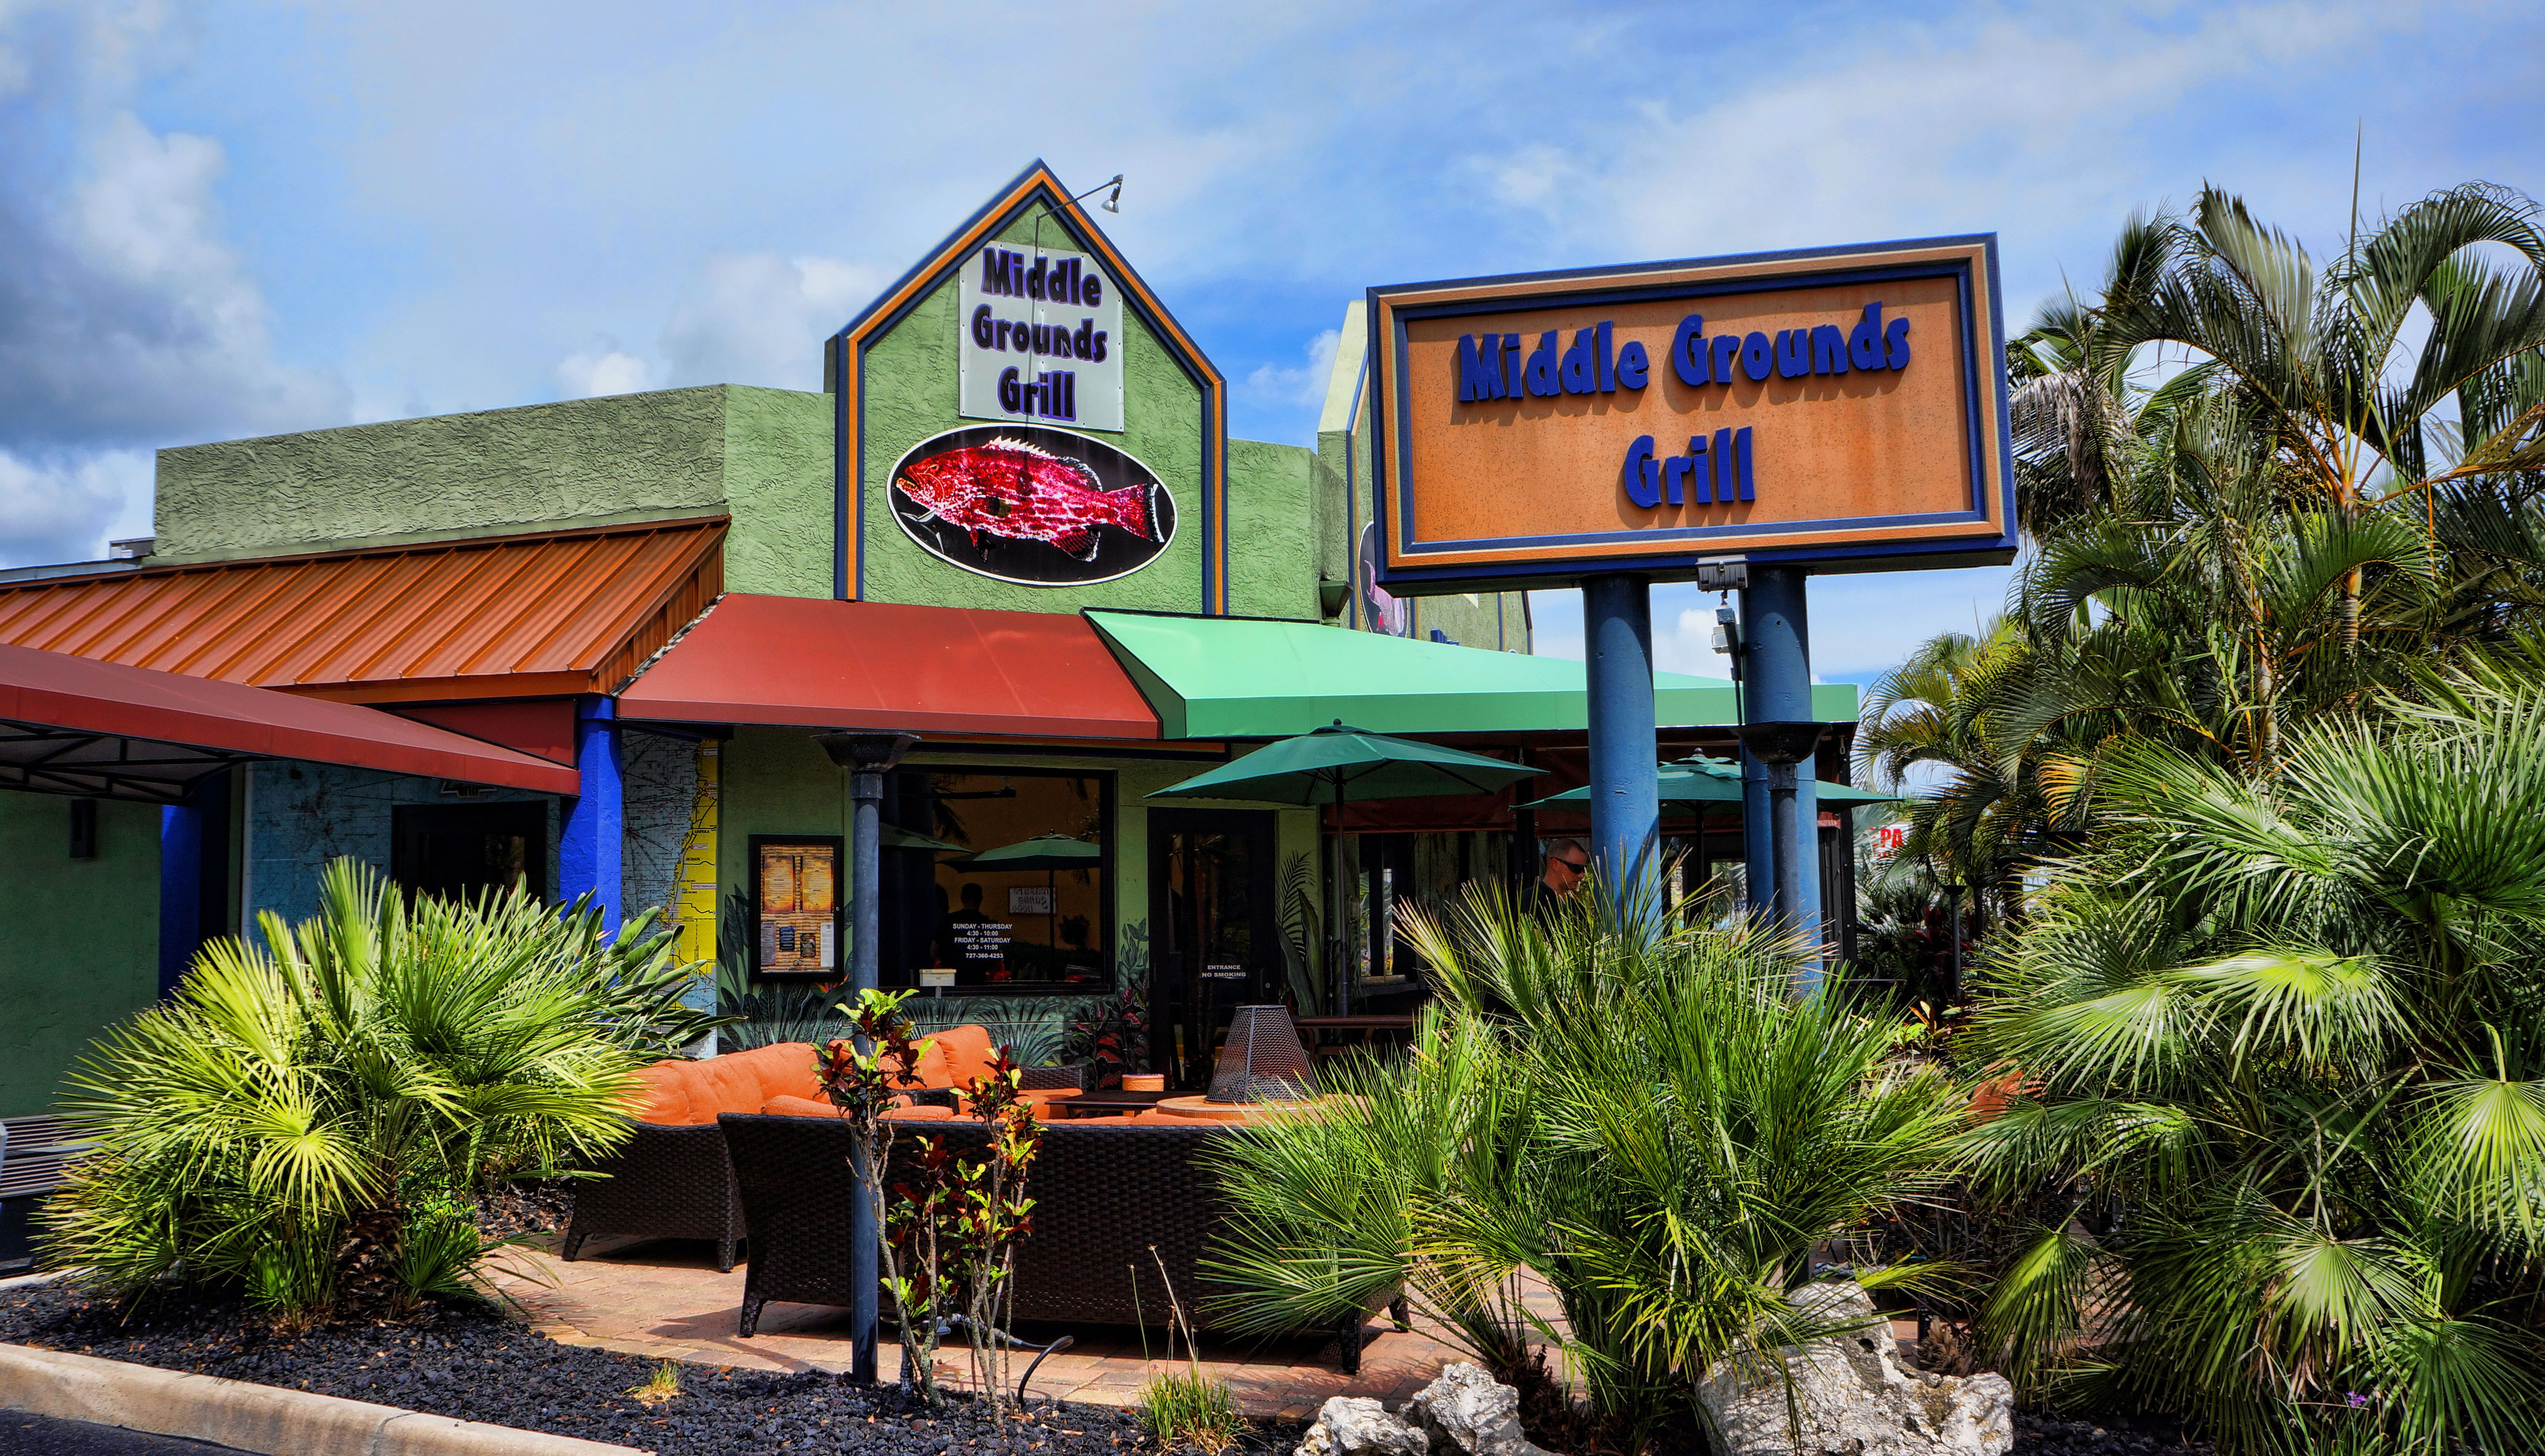 Middle Grounds Grill Treasure Island Florida St Petetampa